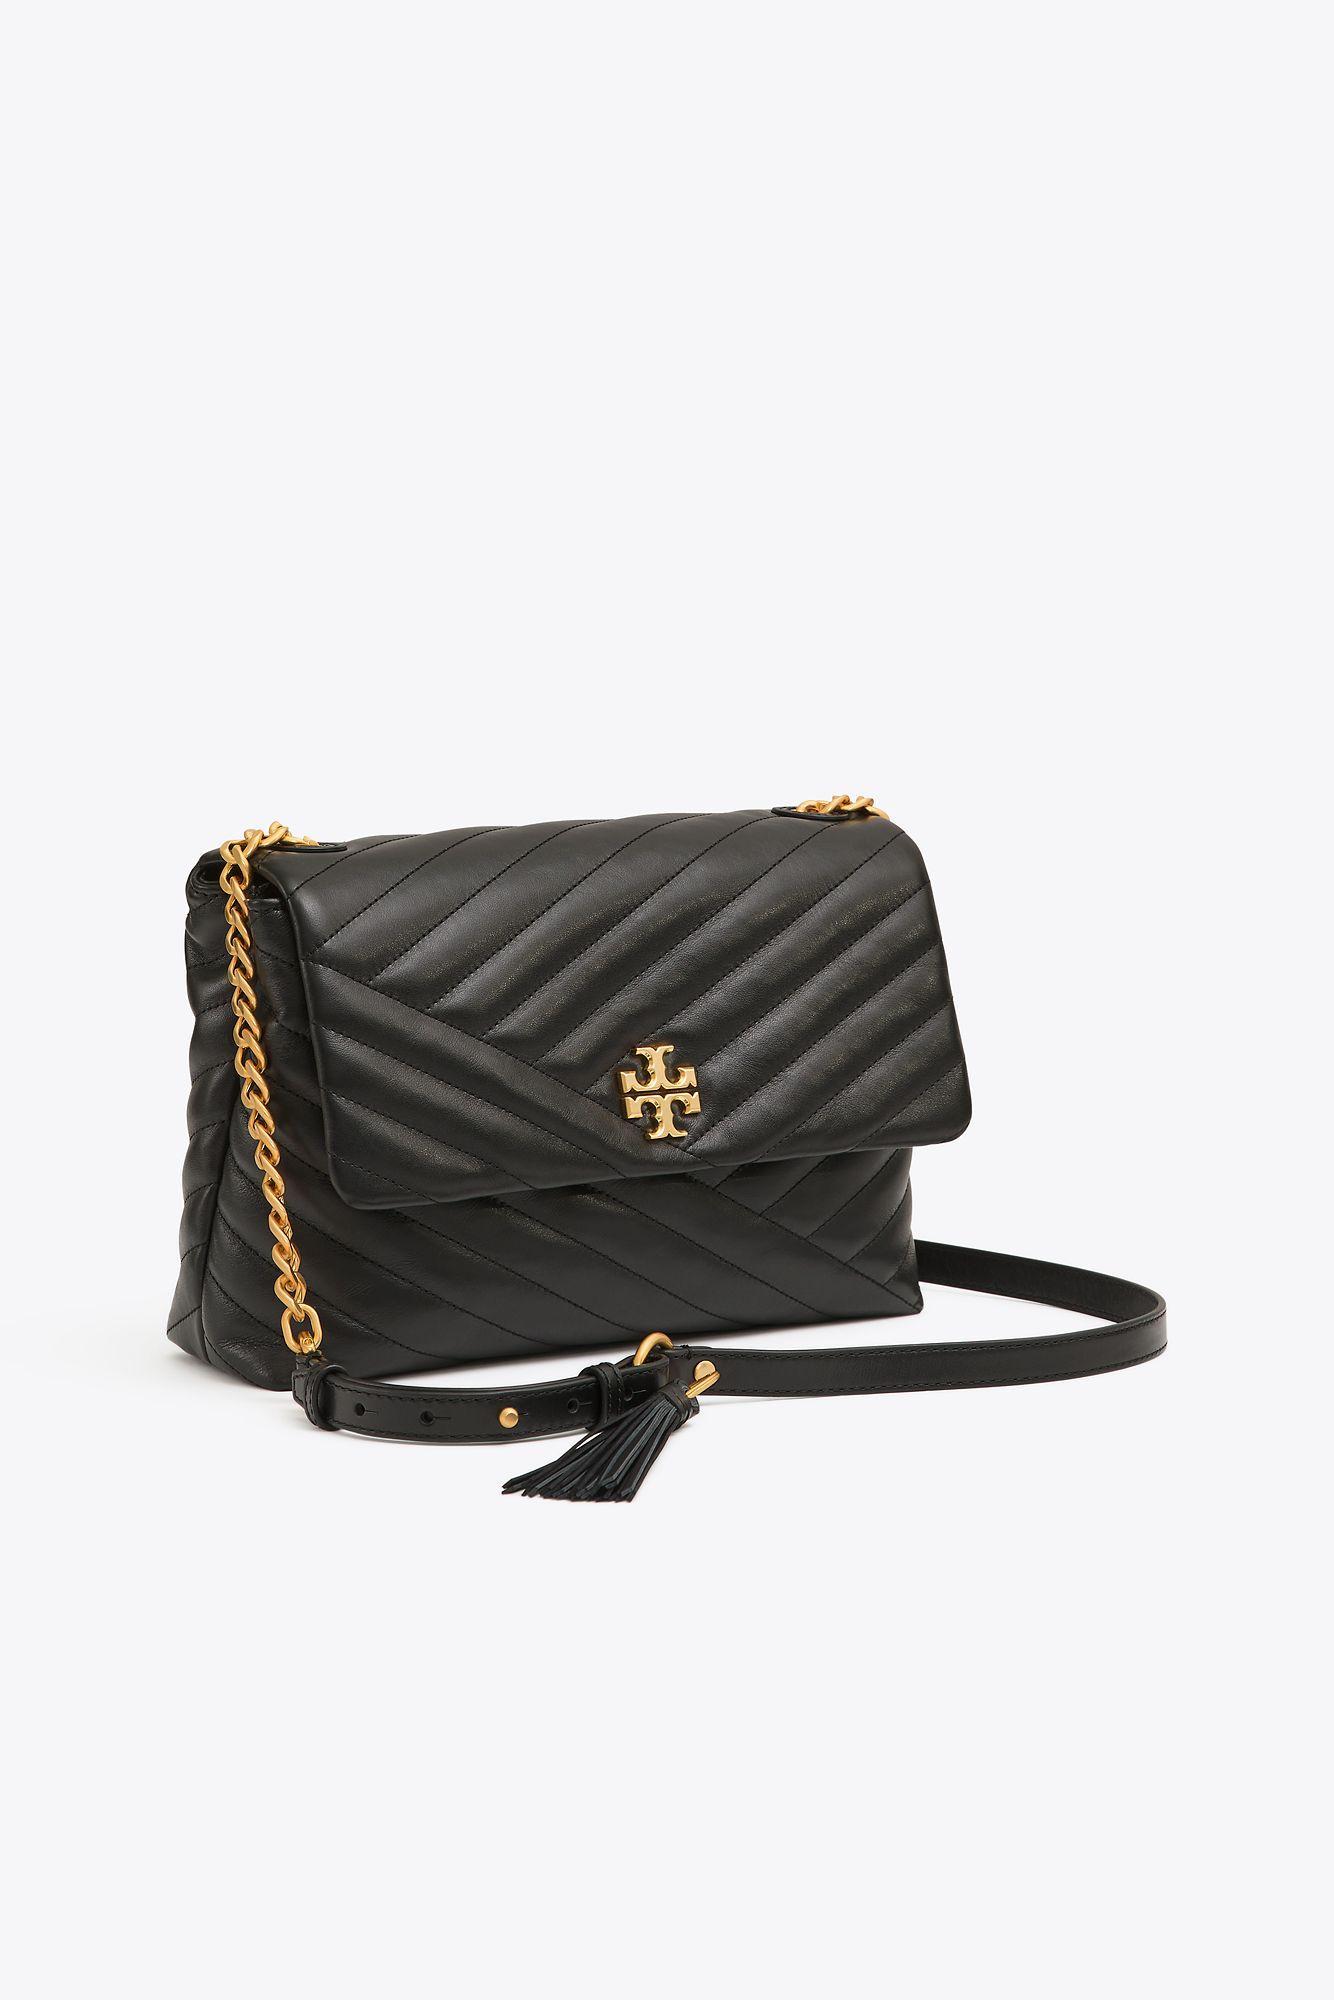 c315f9e88255 Tory Burch Kira Chevron Flap Shoulder Bag in Black - Save 18% - Lyst